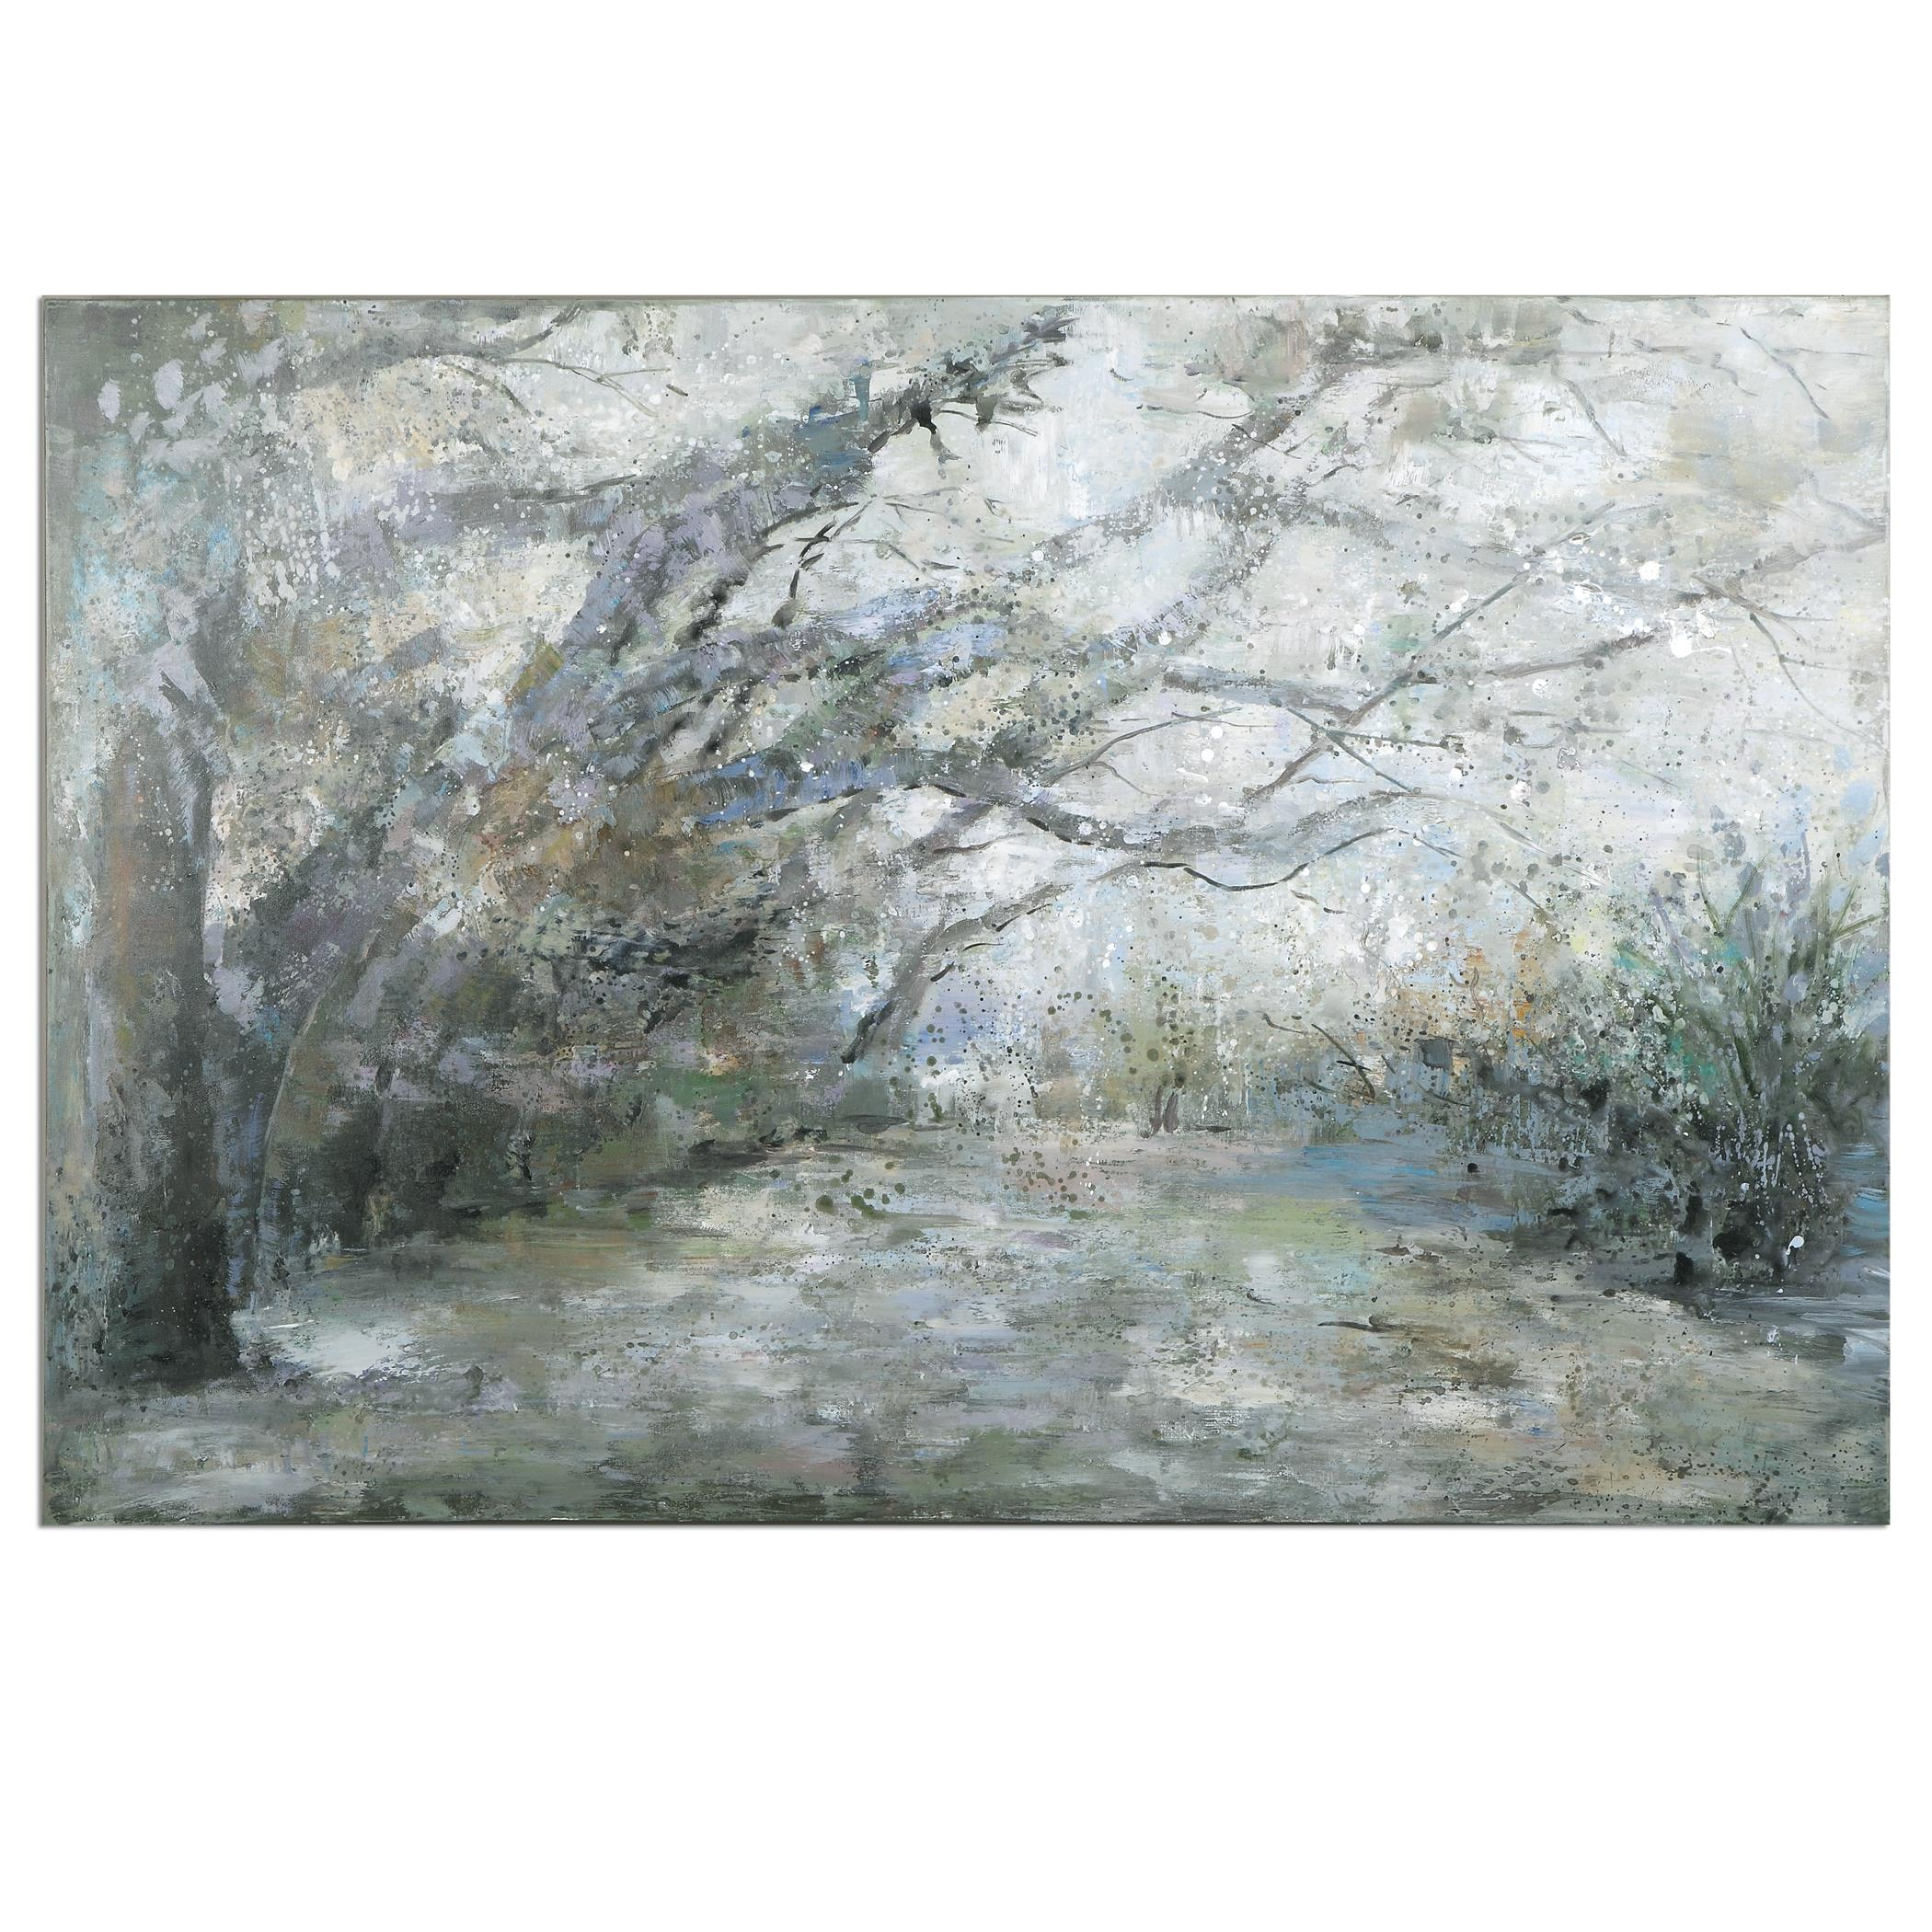 Uttermost Art Forest Lane Canvas Art - Item Number: 31314